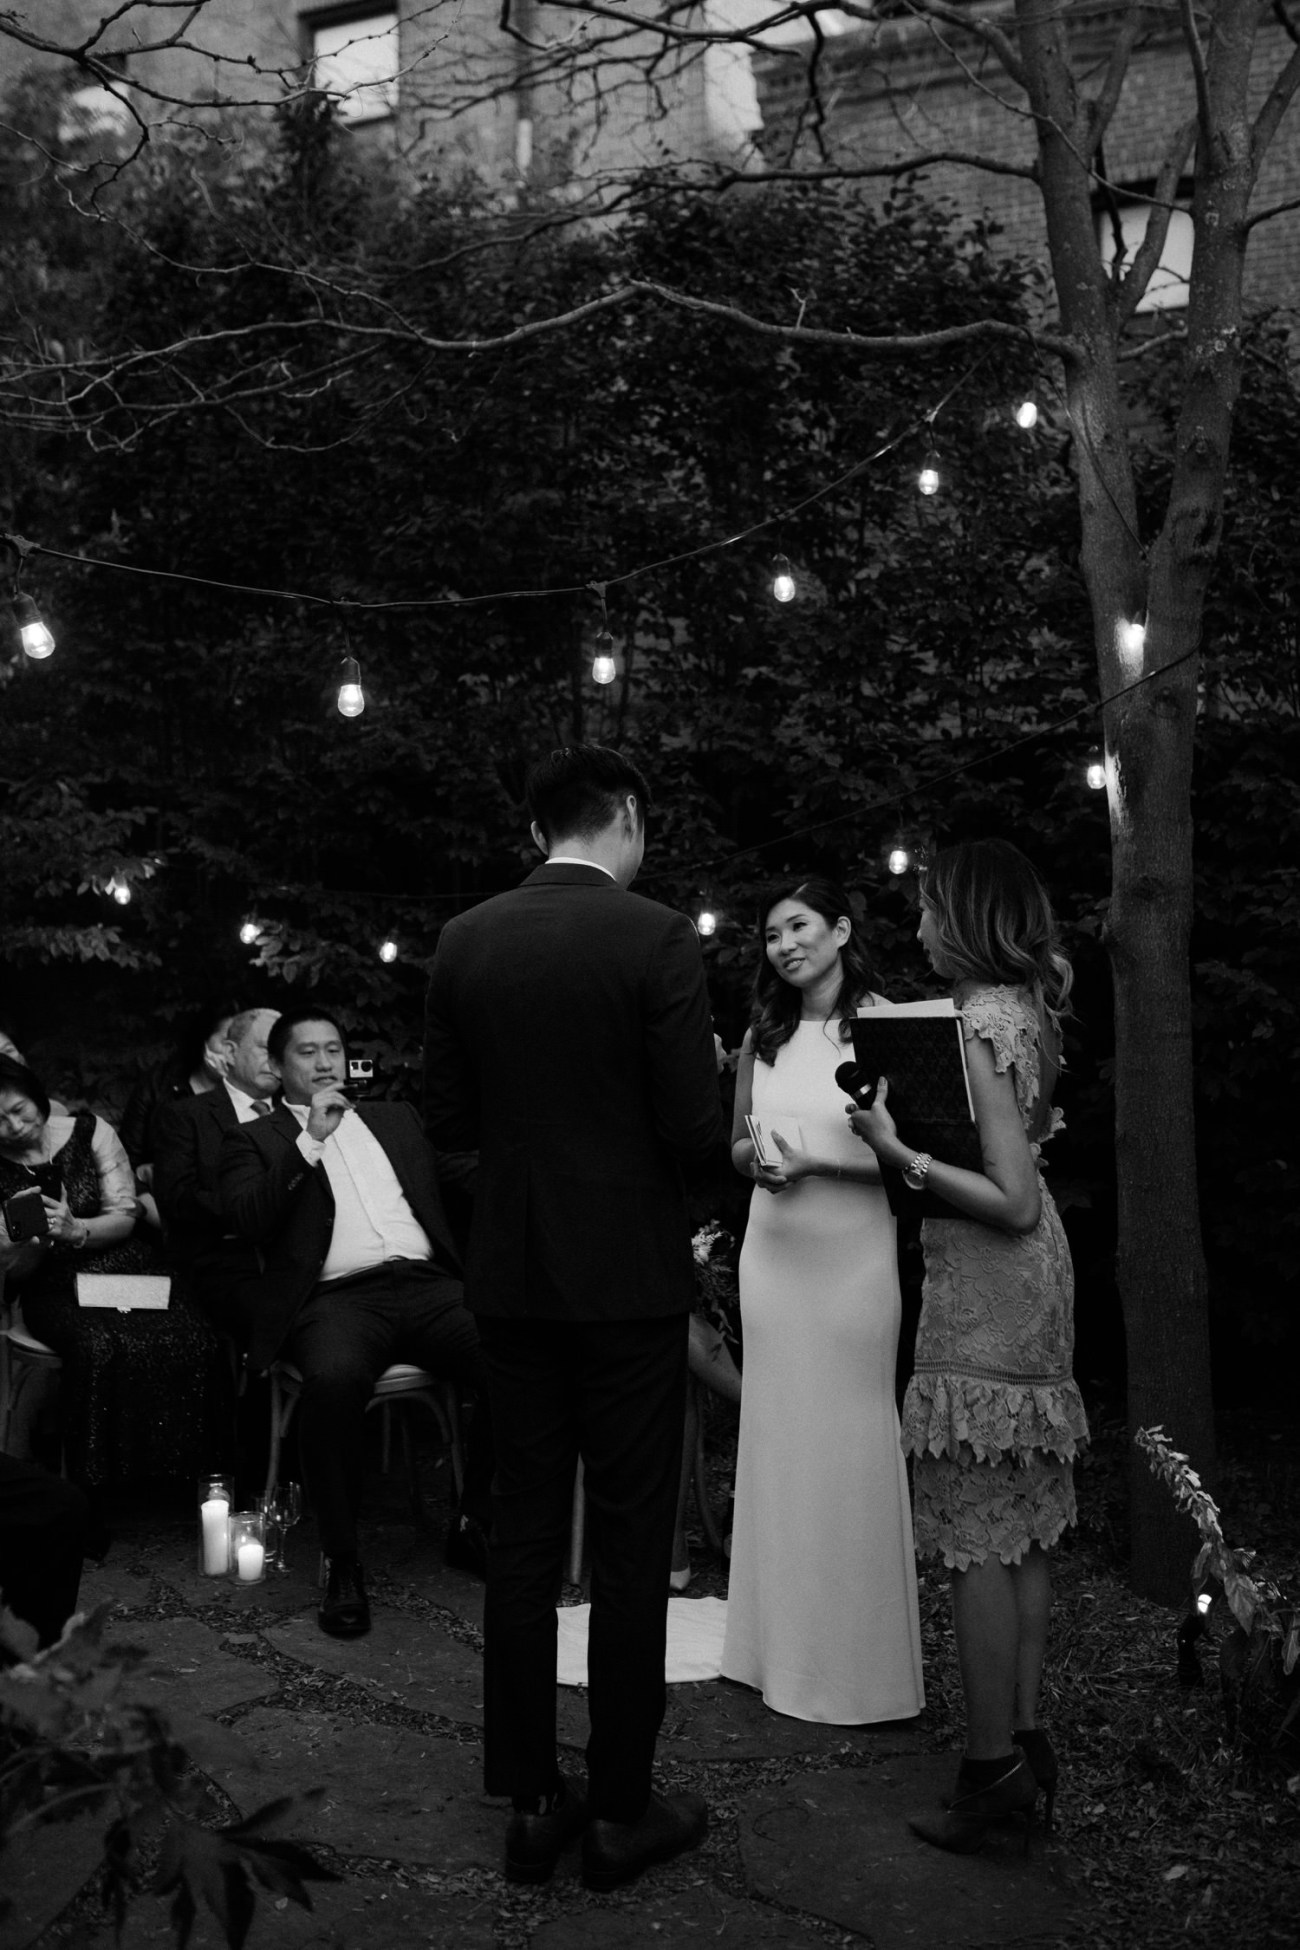 Brooklyn Backyard Wedding In Brownstone House New York City Wedding Photographer Anais Possamai Photography 09